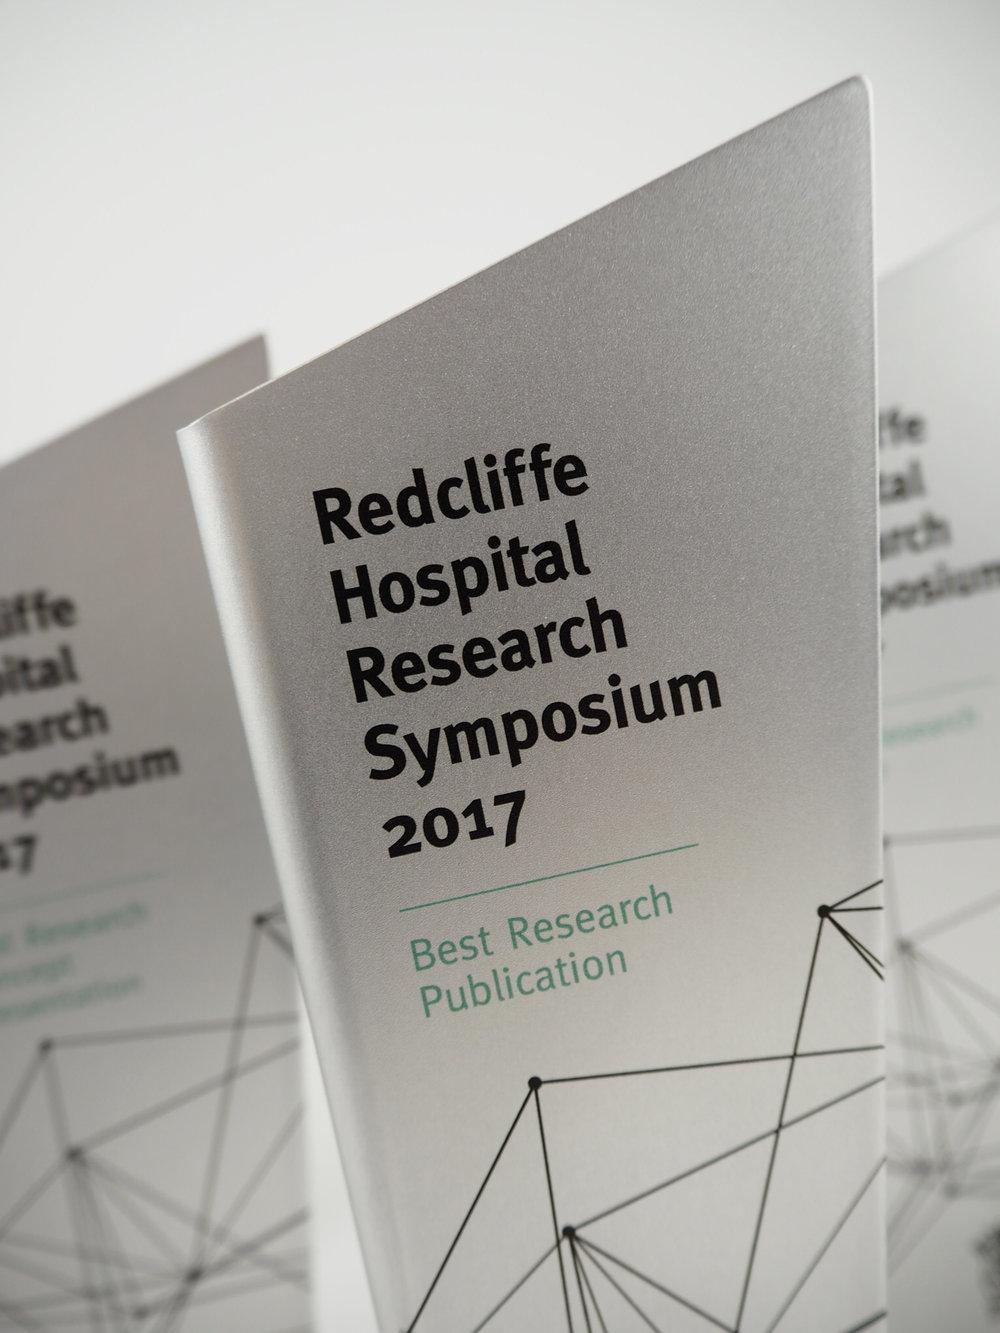 Redcliffe-Hospital-Symposium-eco-aluminium-trophy-award-04.jpg